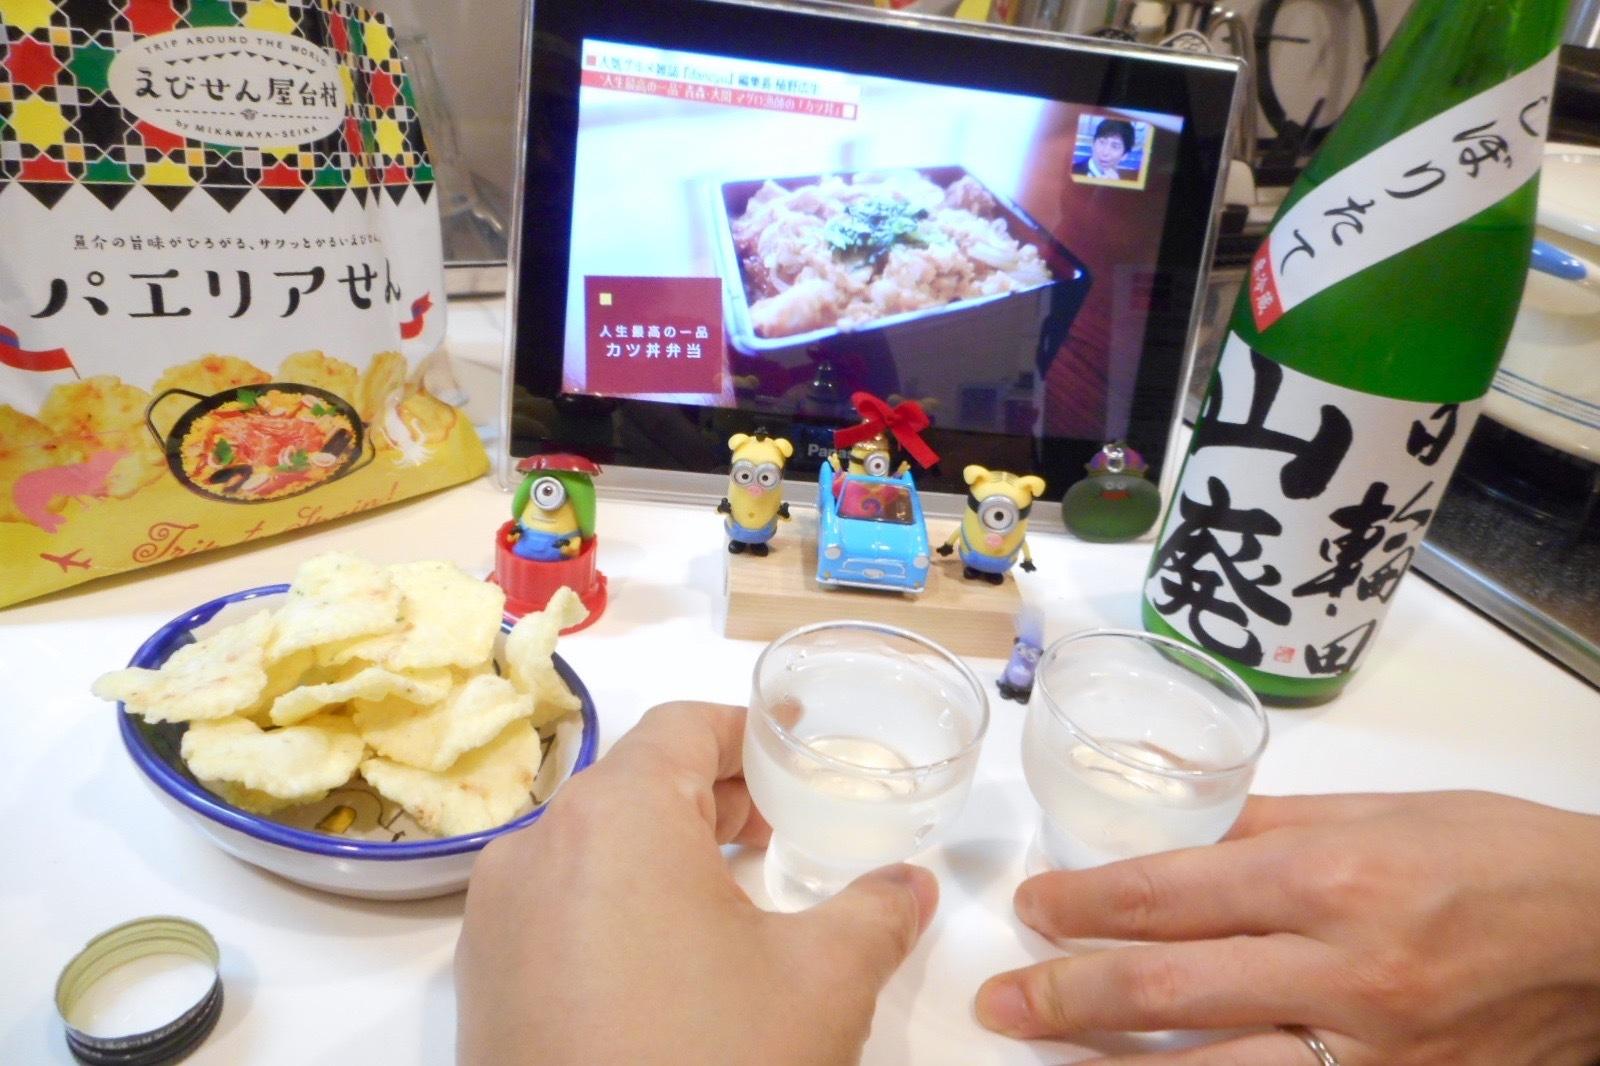 hiwata_junmai_shiboritate28by4.jpg